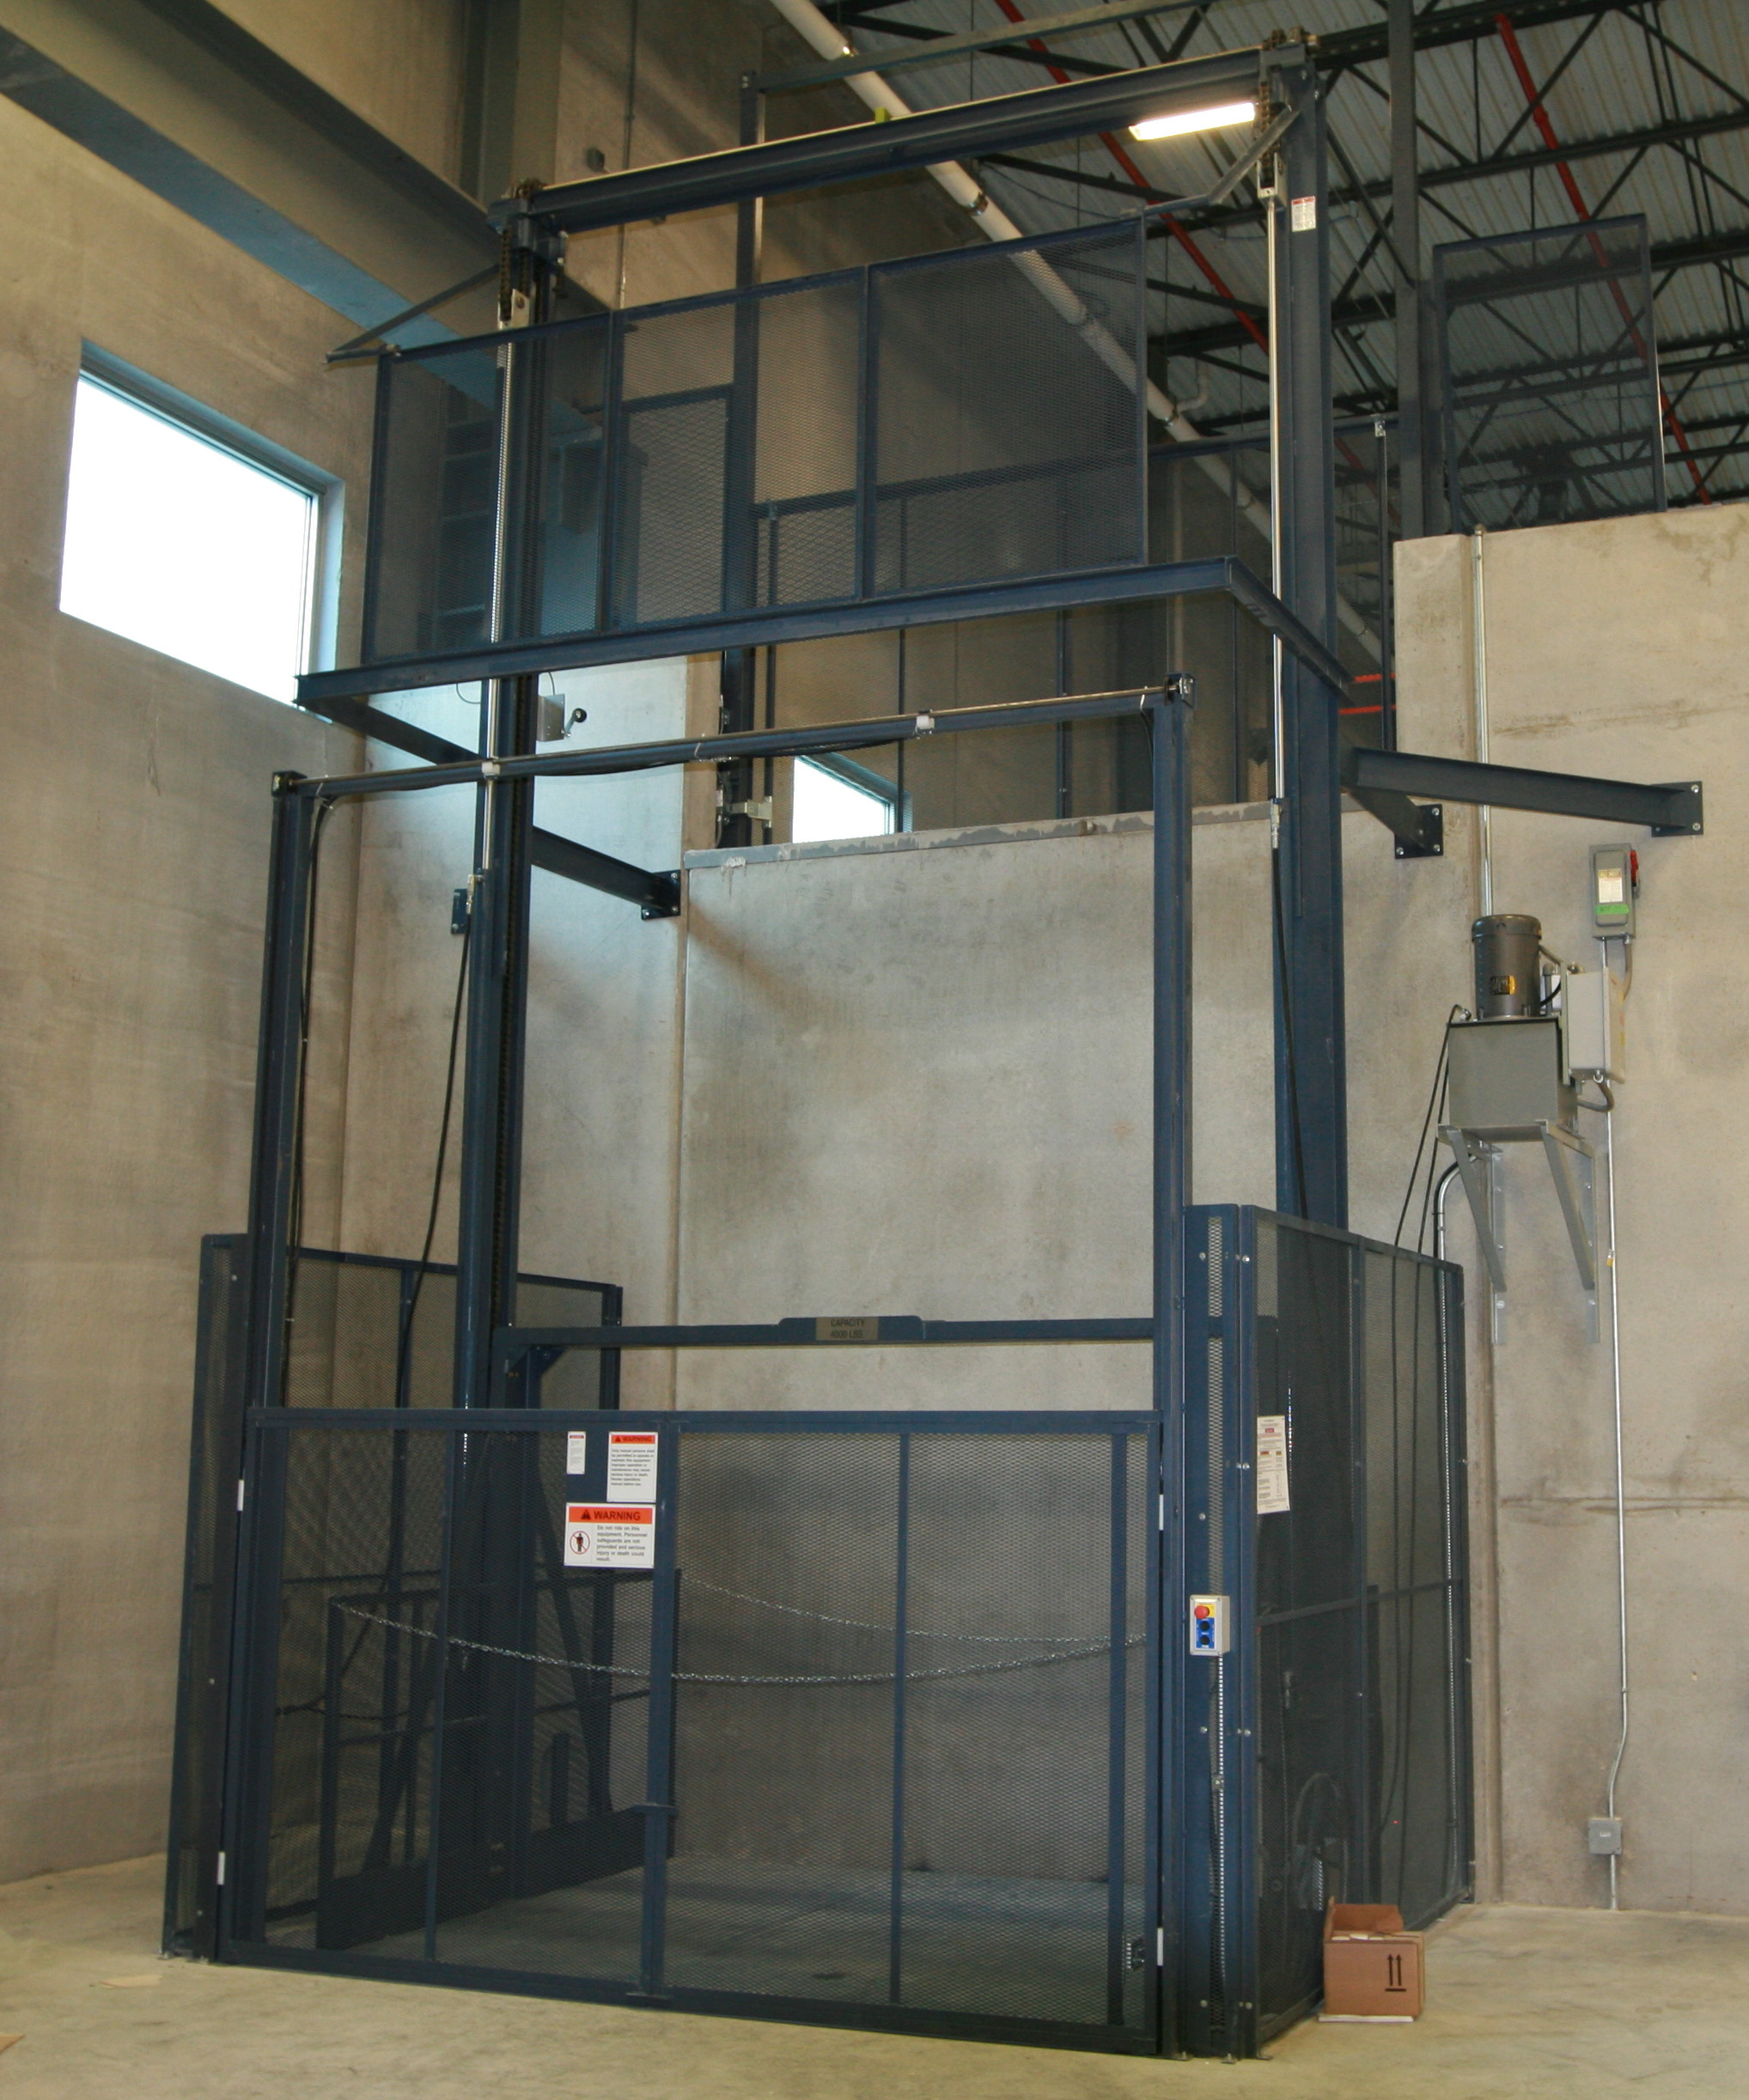 Hydraulic Vertical Lift : Hydraulic vertical lifts w e carlson corporation